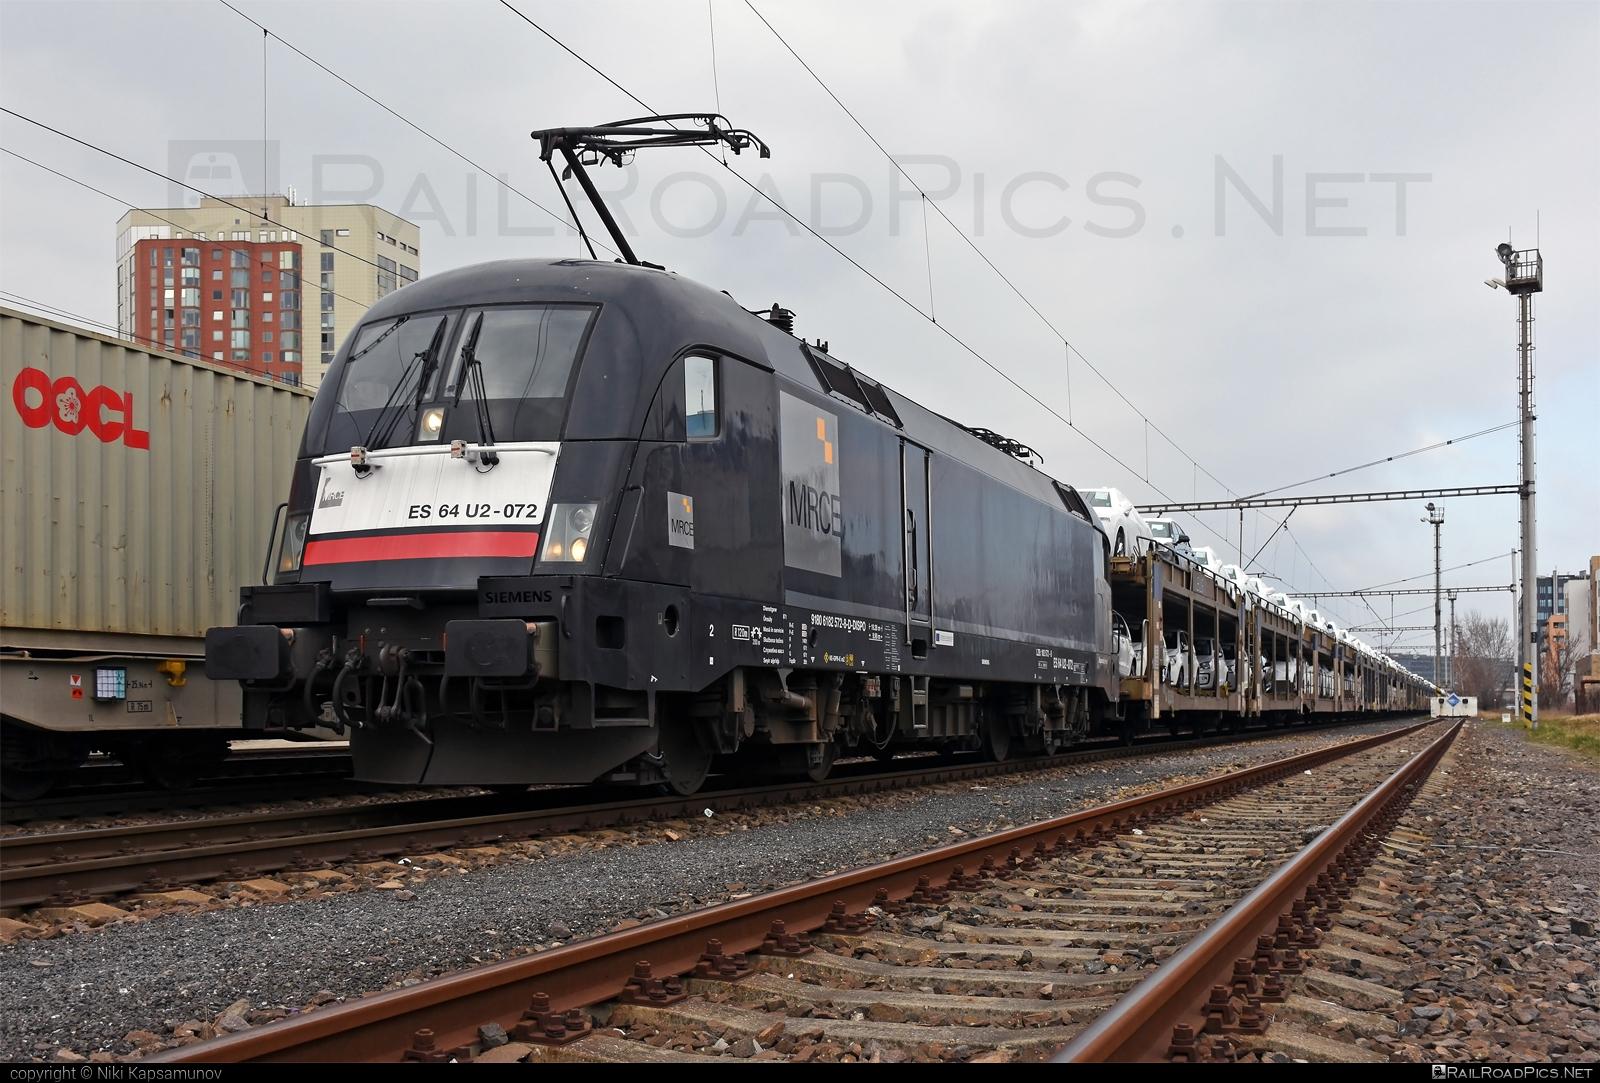 Siemens ES 64 U2 - 182 572-8 operated by ecco-rail GmbH #carcarrierwagon #dispolok #eccorail #eccorailgmbh #es64 #es64u #es64u2 #eurosprinter #mitsuirailcapitaleurope #mitsuirailcapitaleuropegmbh #mrce #siemens #siemenses64 #siemenses64u #siemenses64u2 #siemenstaurus #taurus #tauruslocomotive